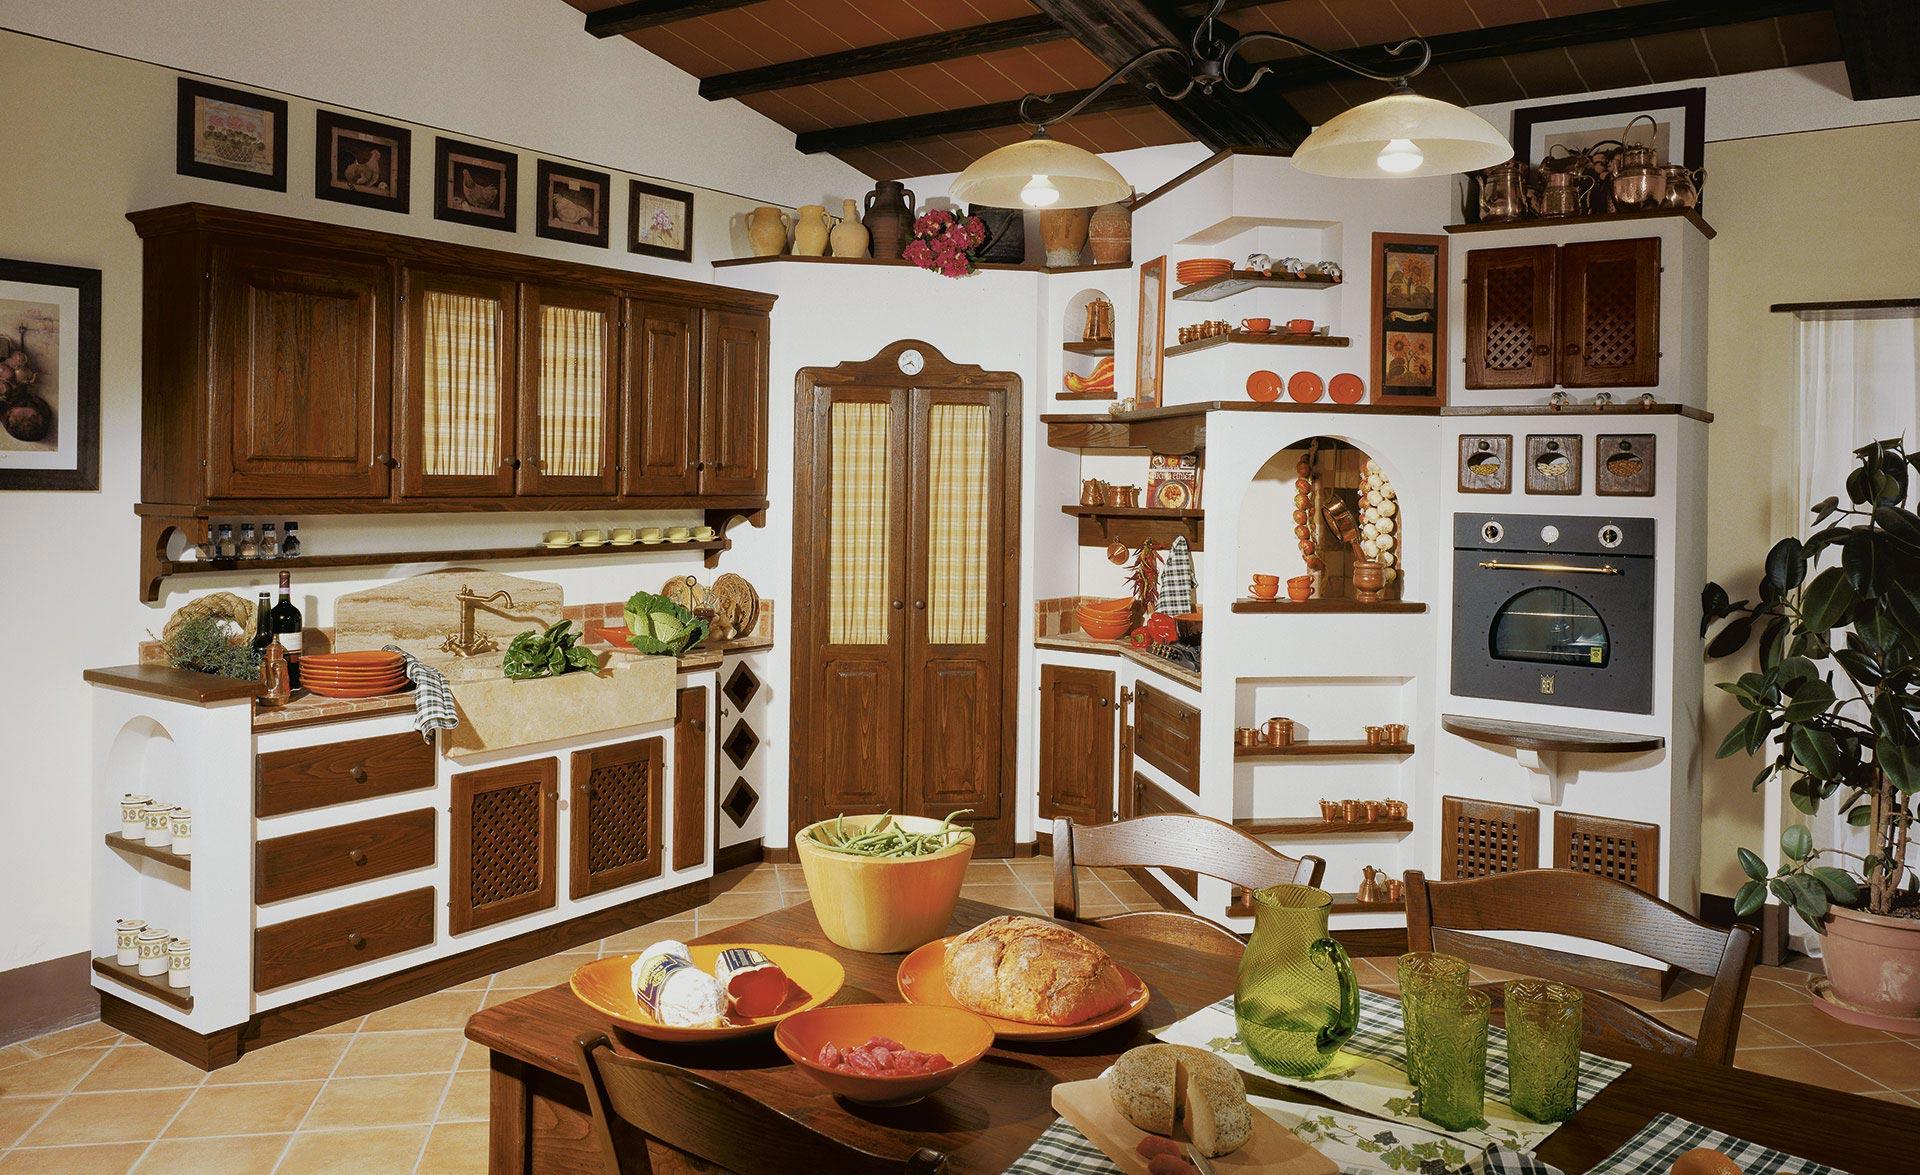 Programma per progettare cucine best skyline sala for Programma per progettare casa gratis